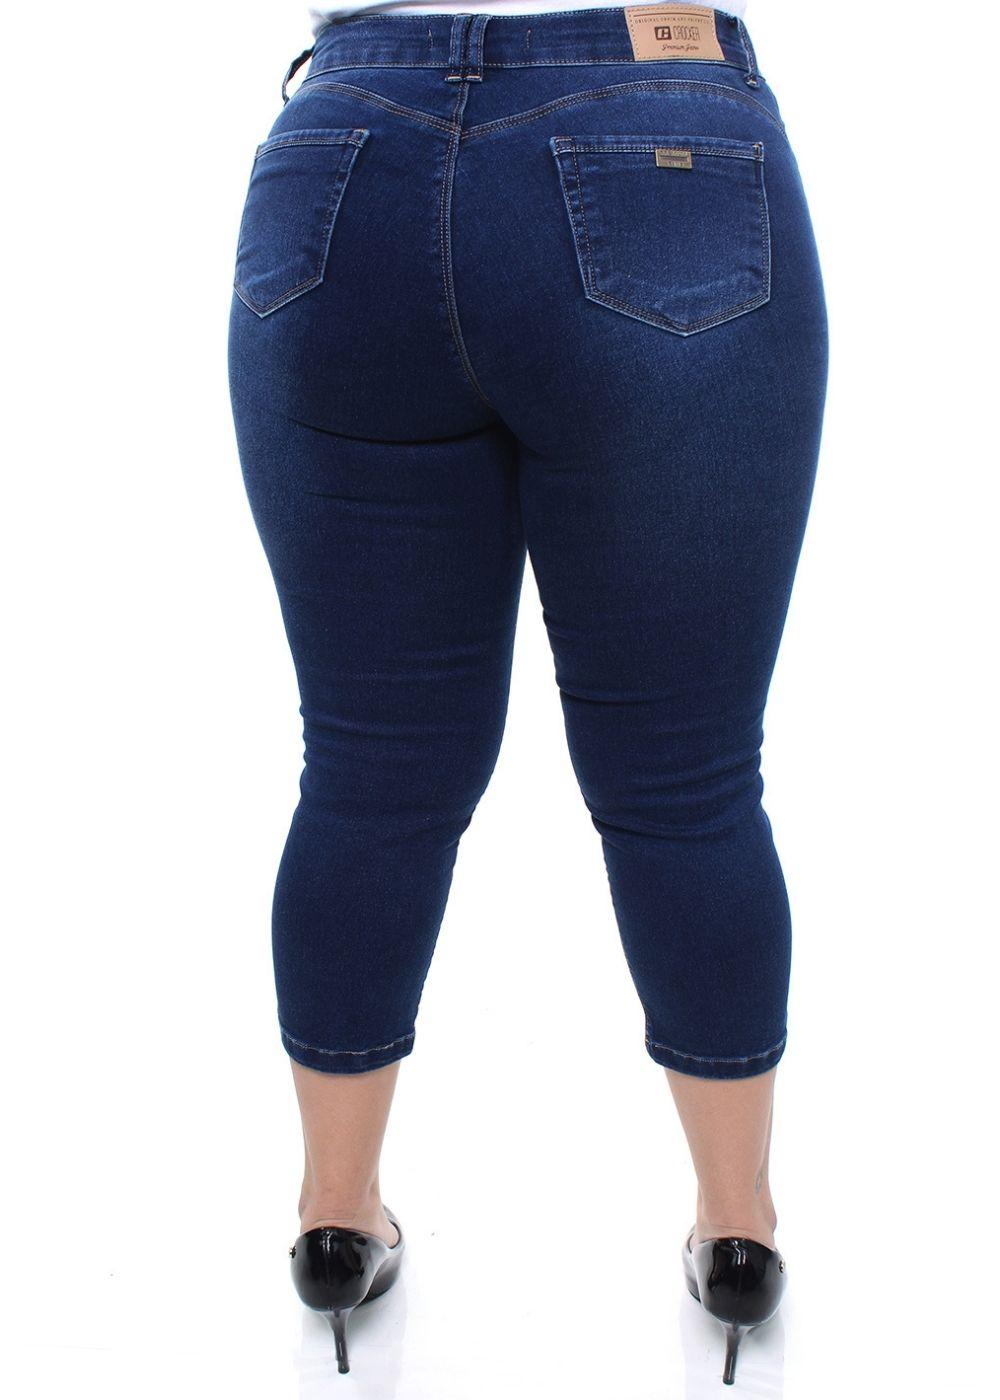 Calça Jeans Plus Size Feminina Capri Crocker - 47770